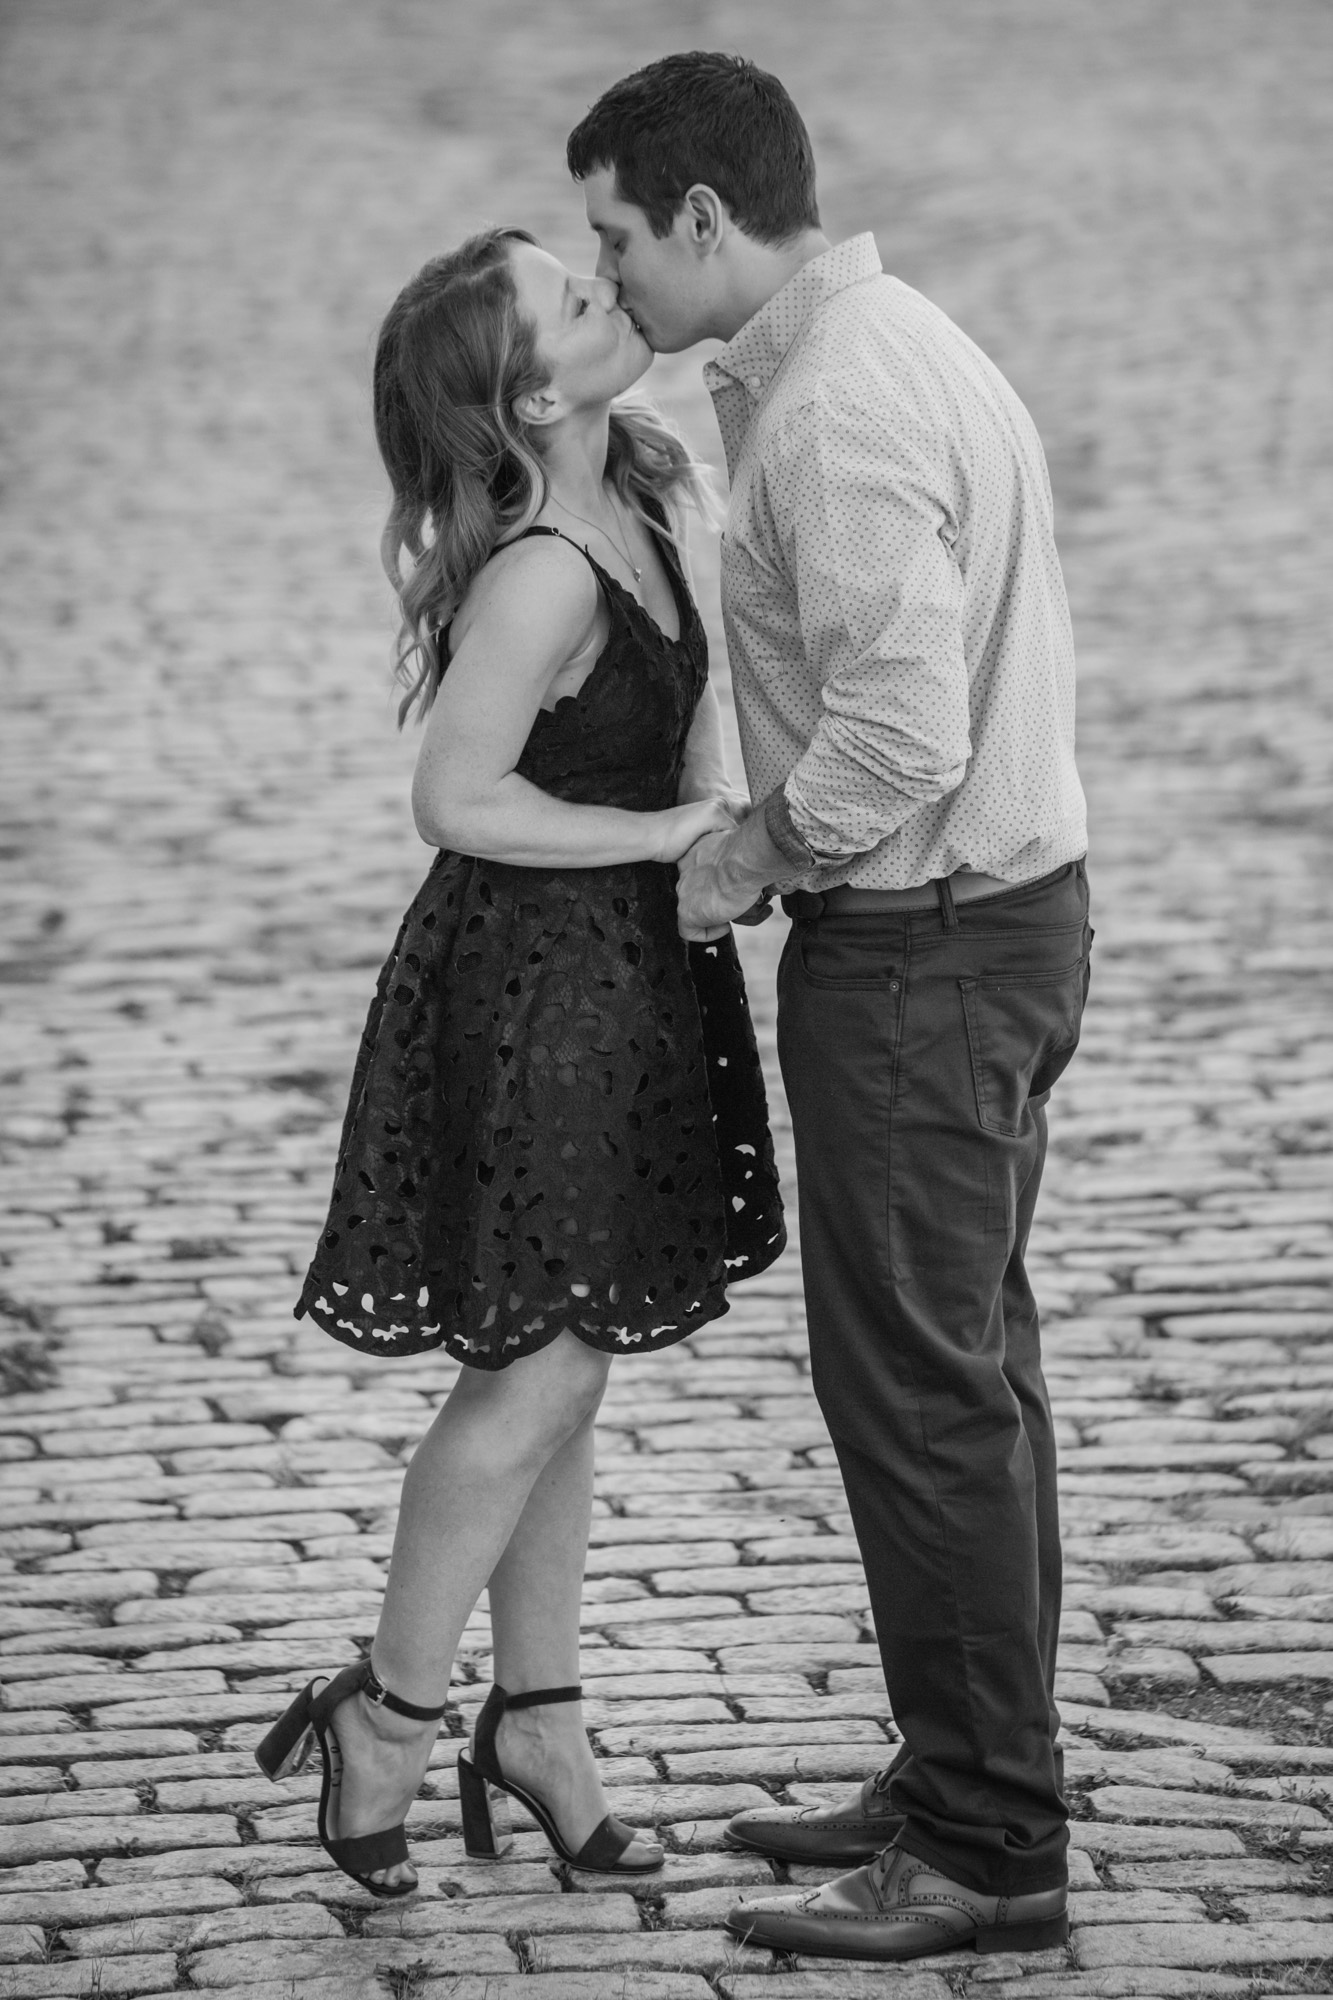 scranton_wedding_photographer_lettieri_pa (17 of 19).jpg